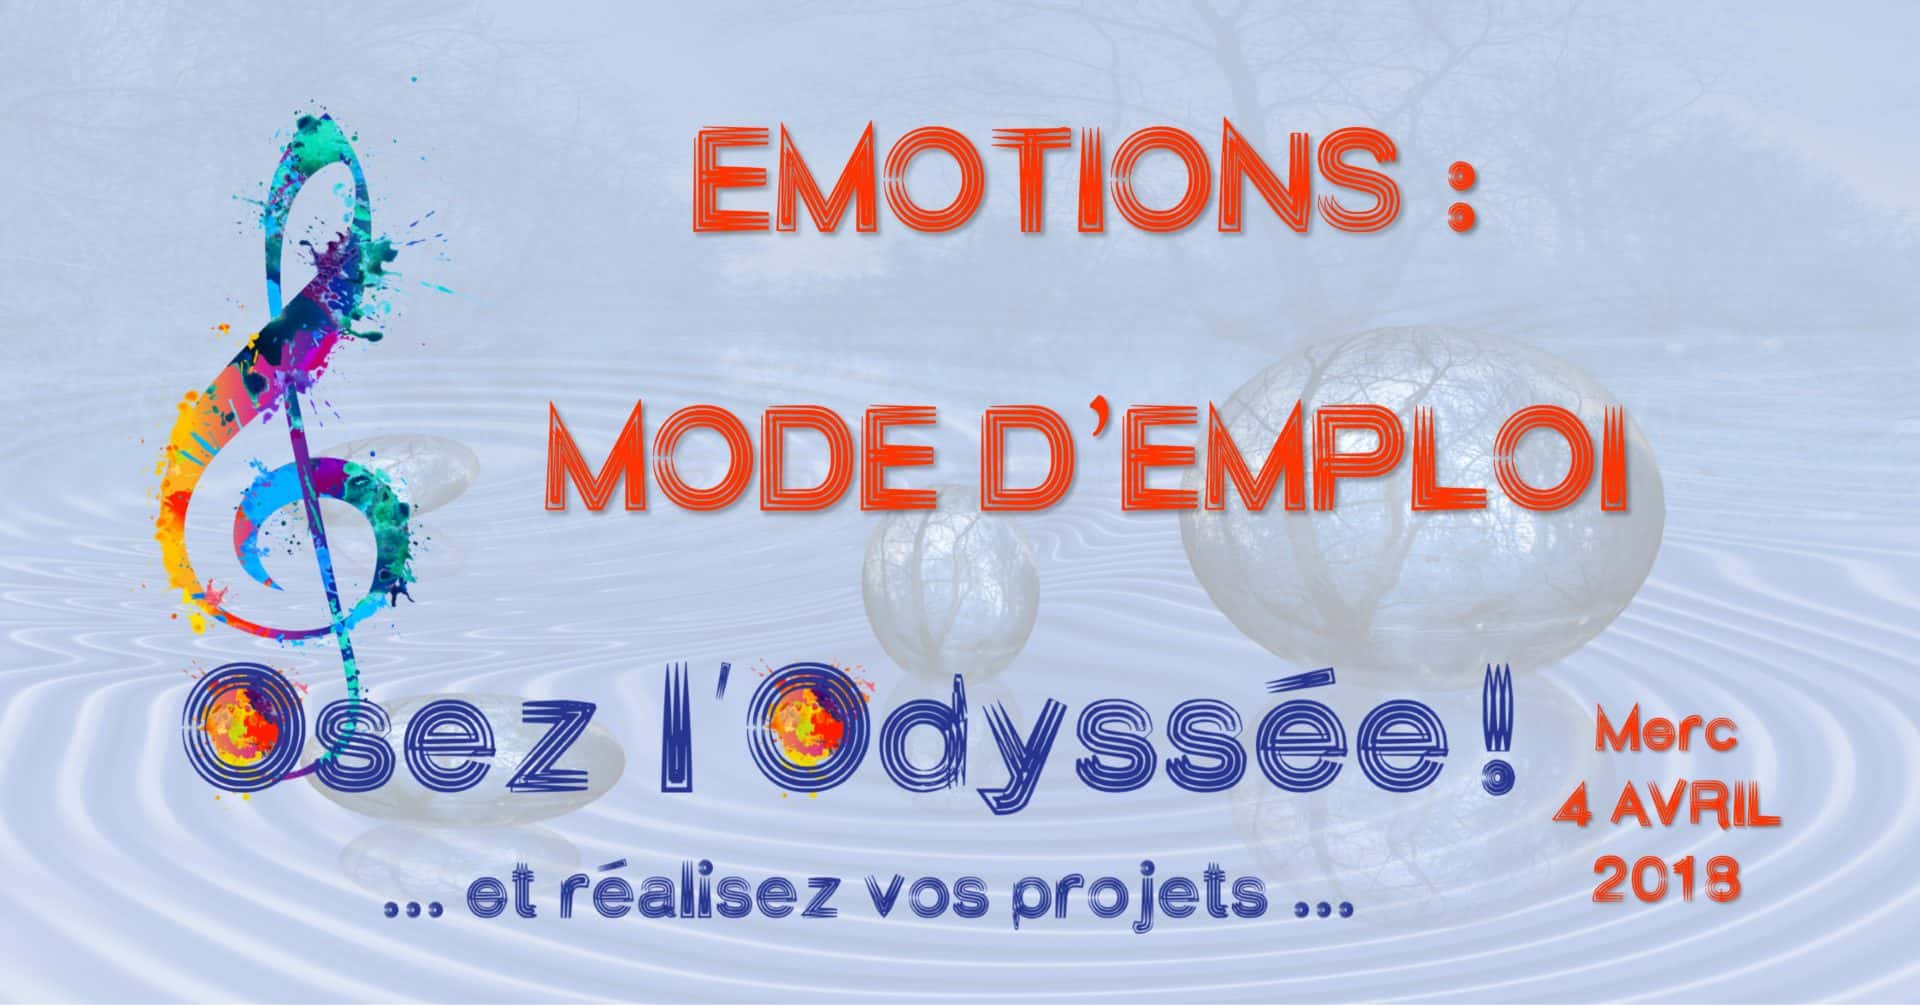 Emotions mode d'emploi avril 2018 Coaching Osez l'Odyssée